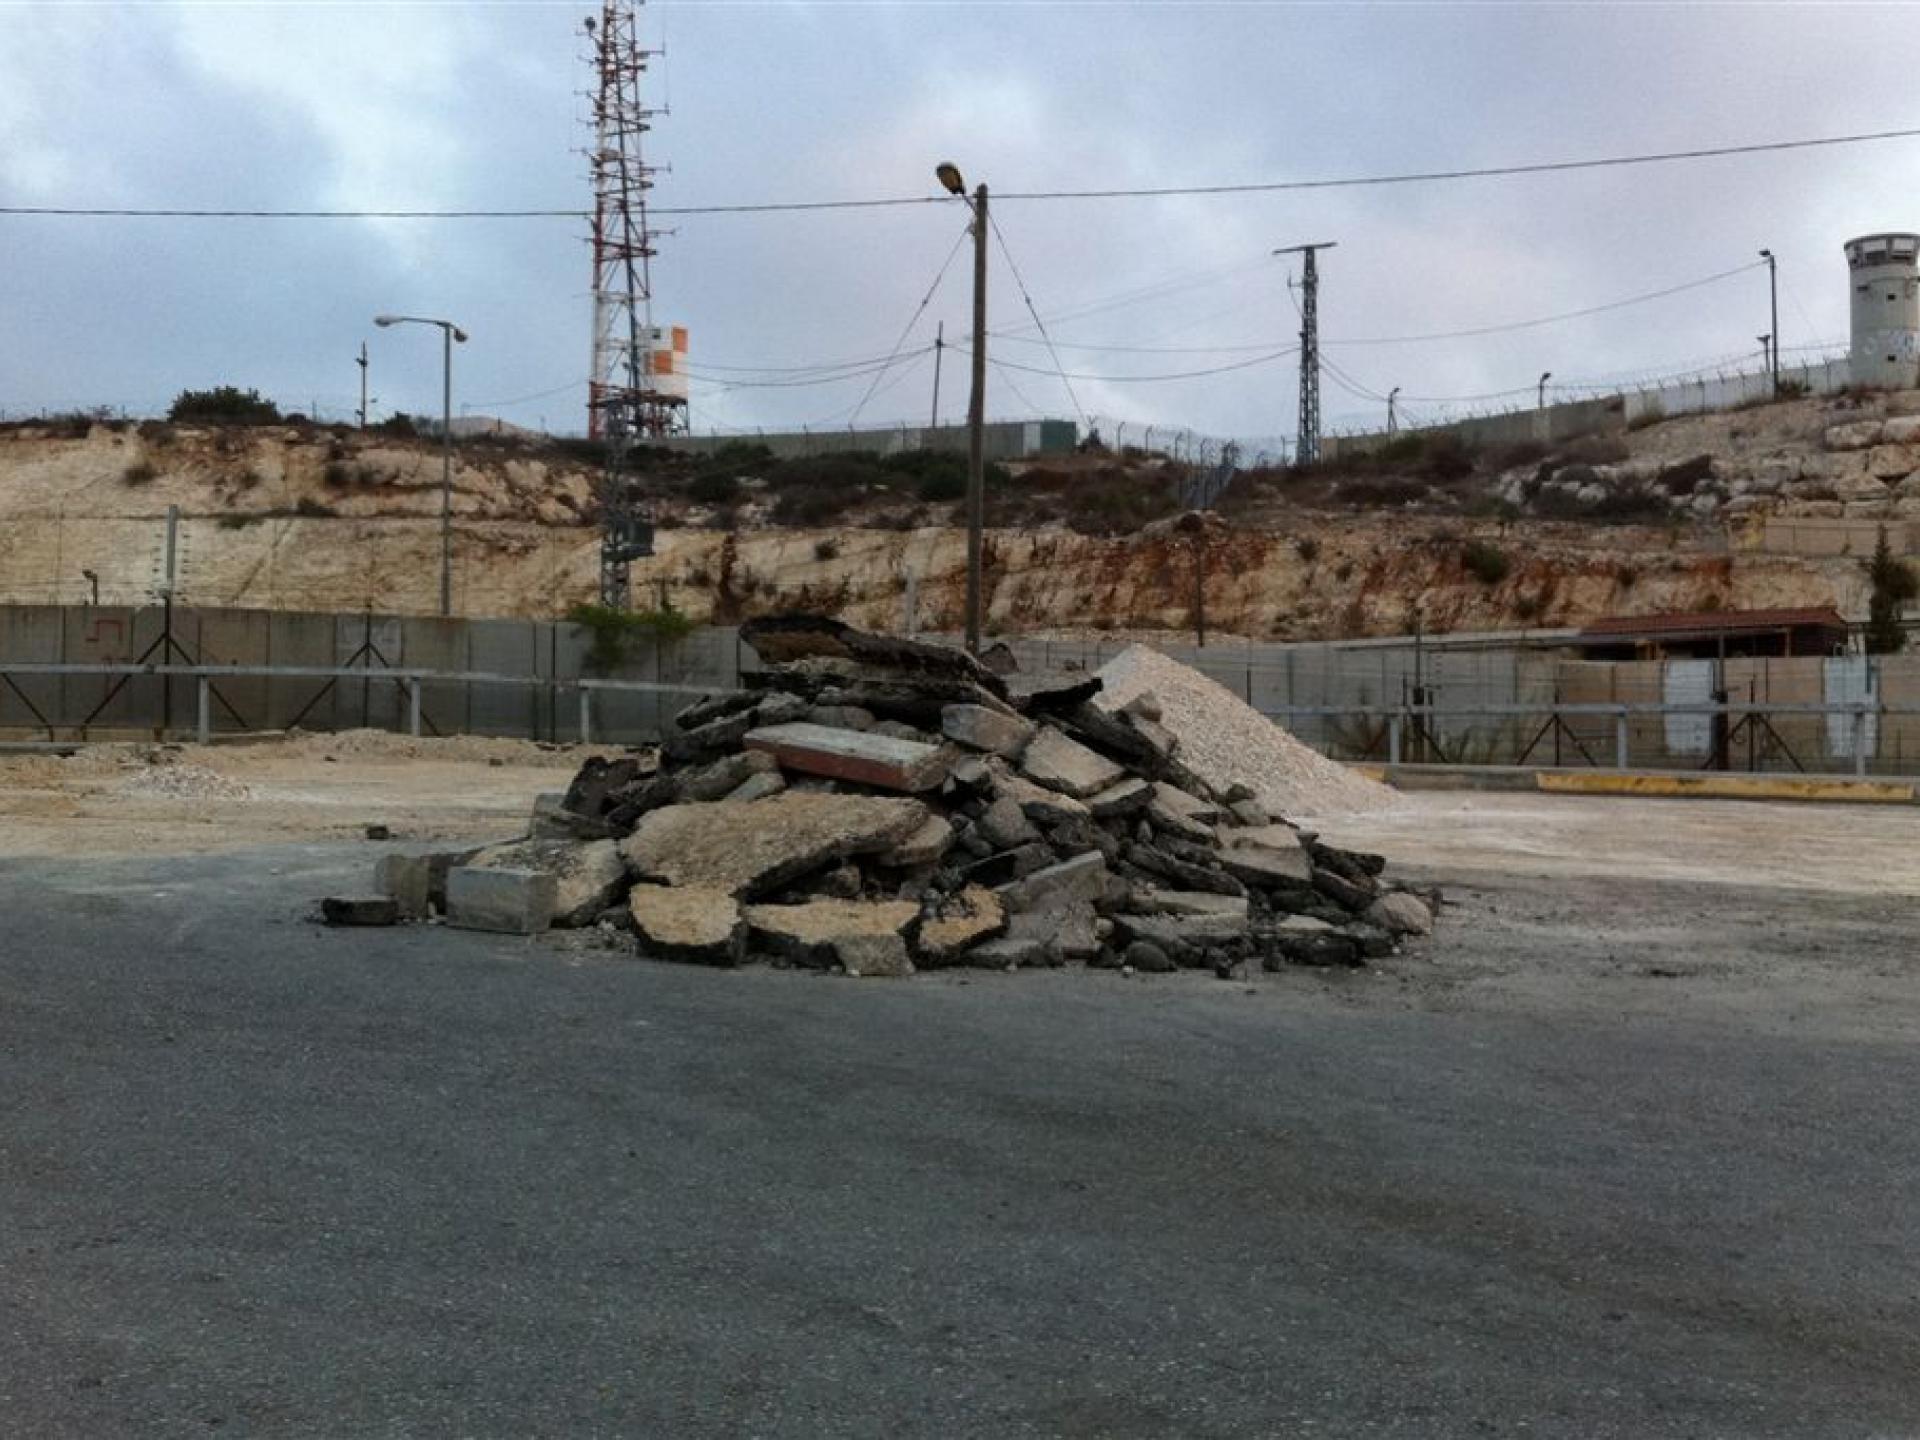 24.08.14 Barta'a/Reichan Checkpoint מחסום ברטעה-ריחן